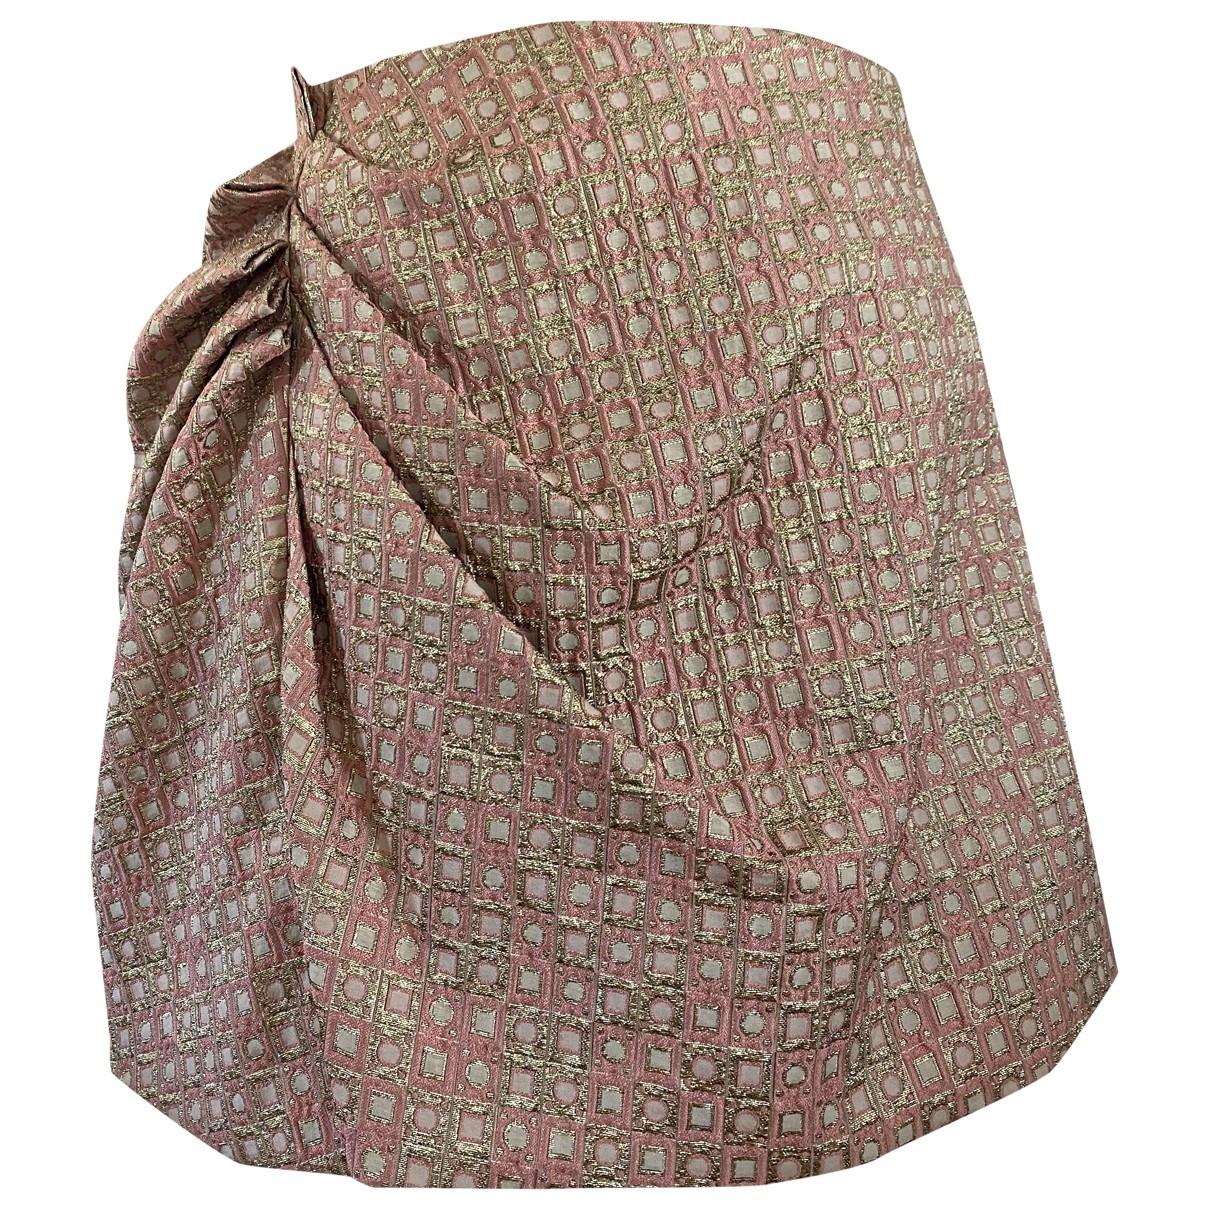 Miu Miu \N Multicolour skirt for Women 42 IT